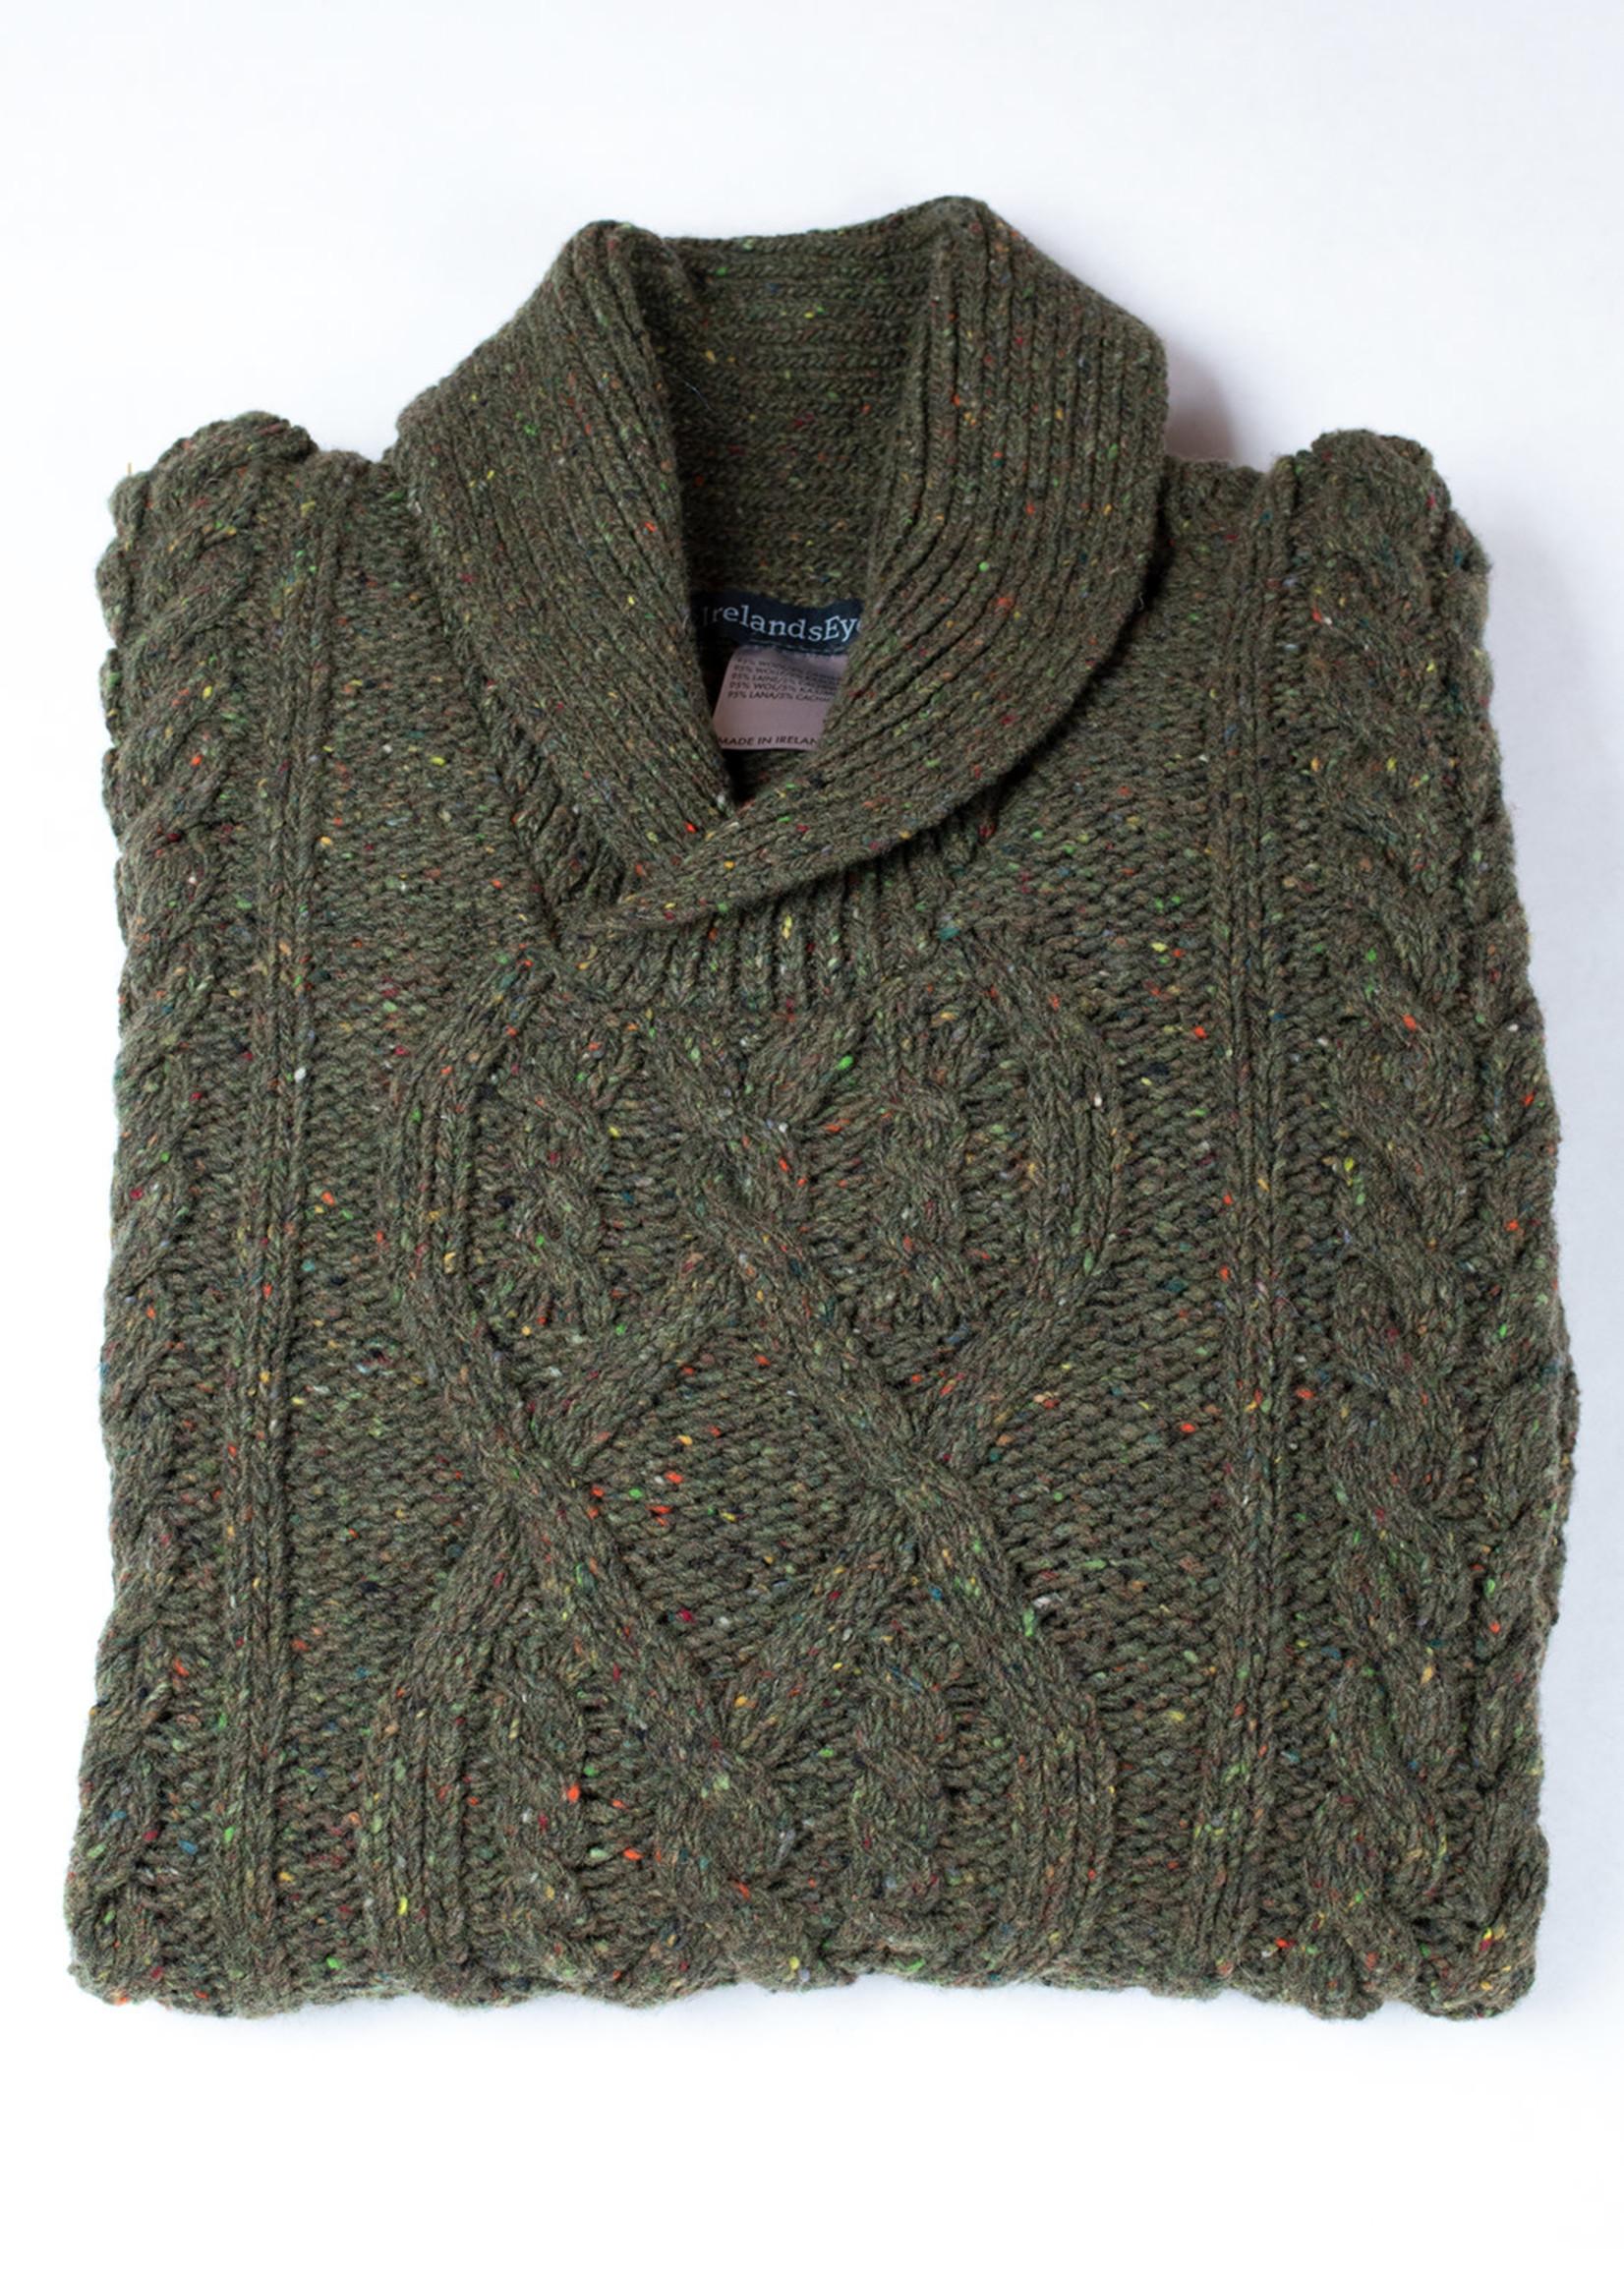 Ireland's Eye Clonard Loden Shawl Collar Cable Sweater by Ireland's Eye